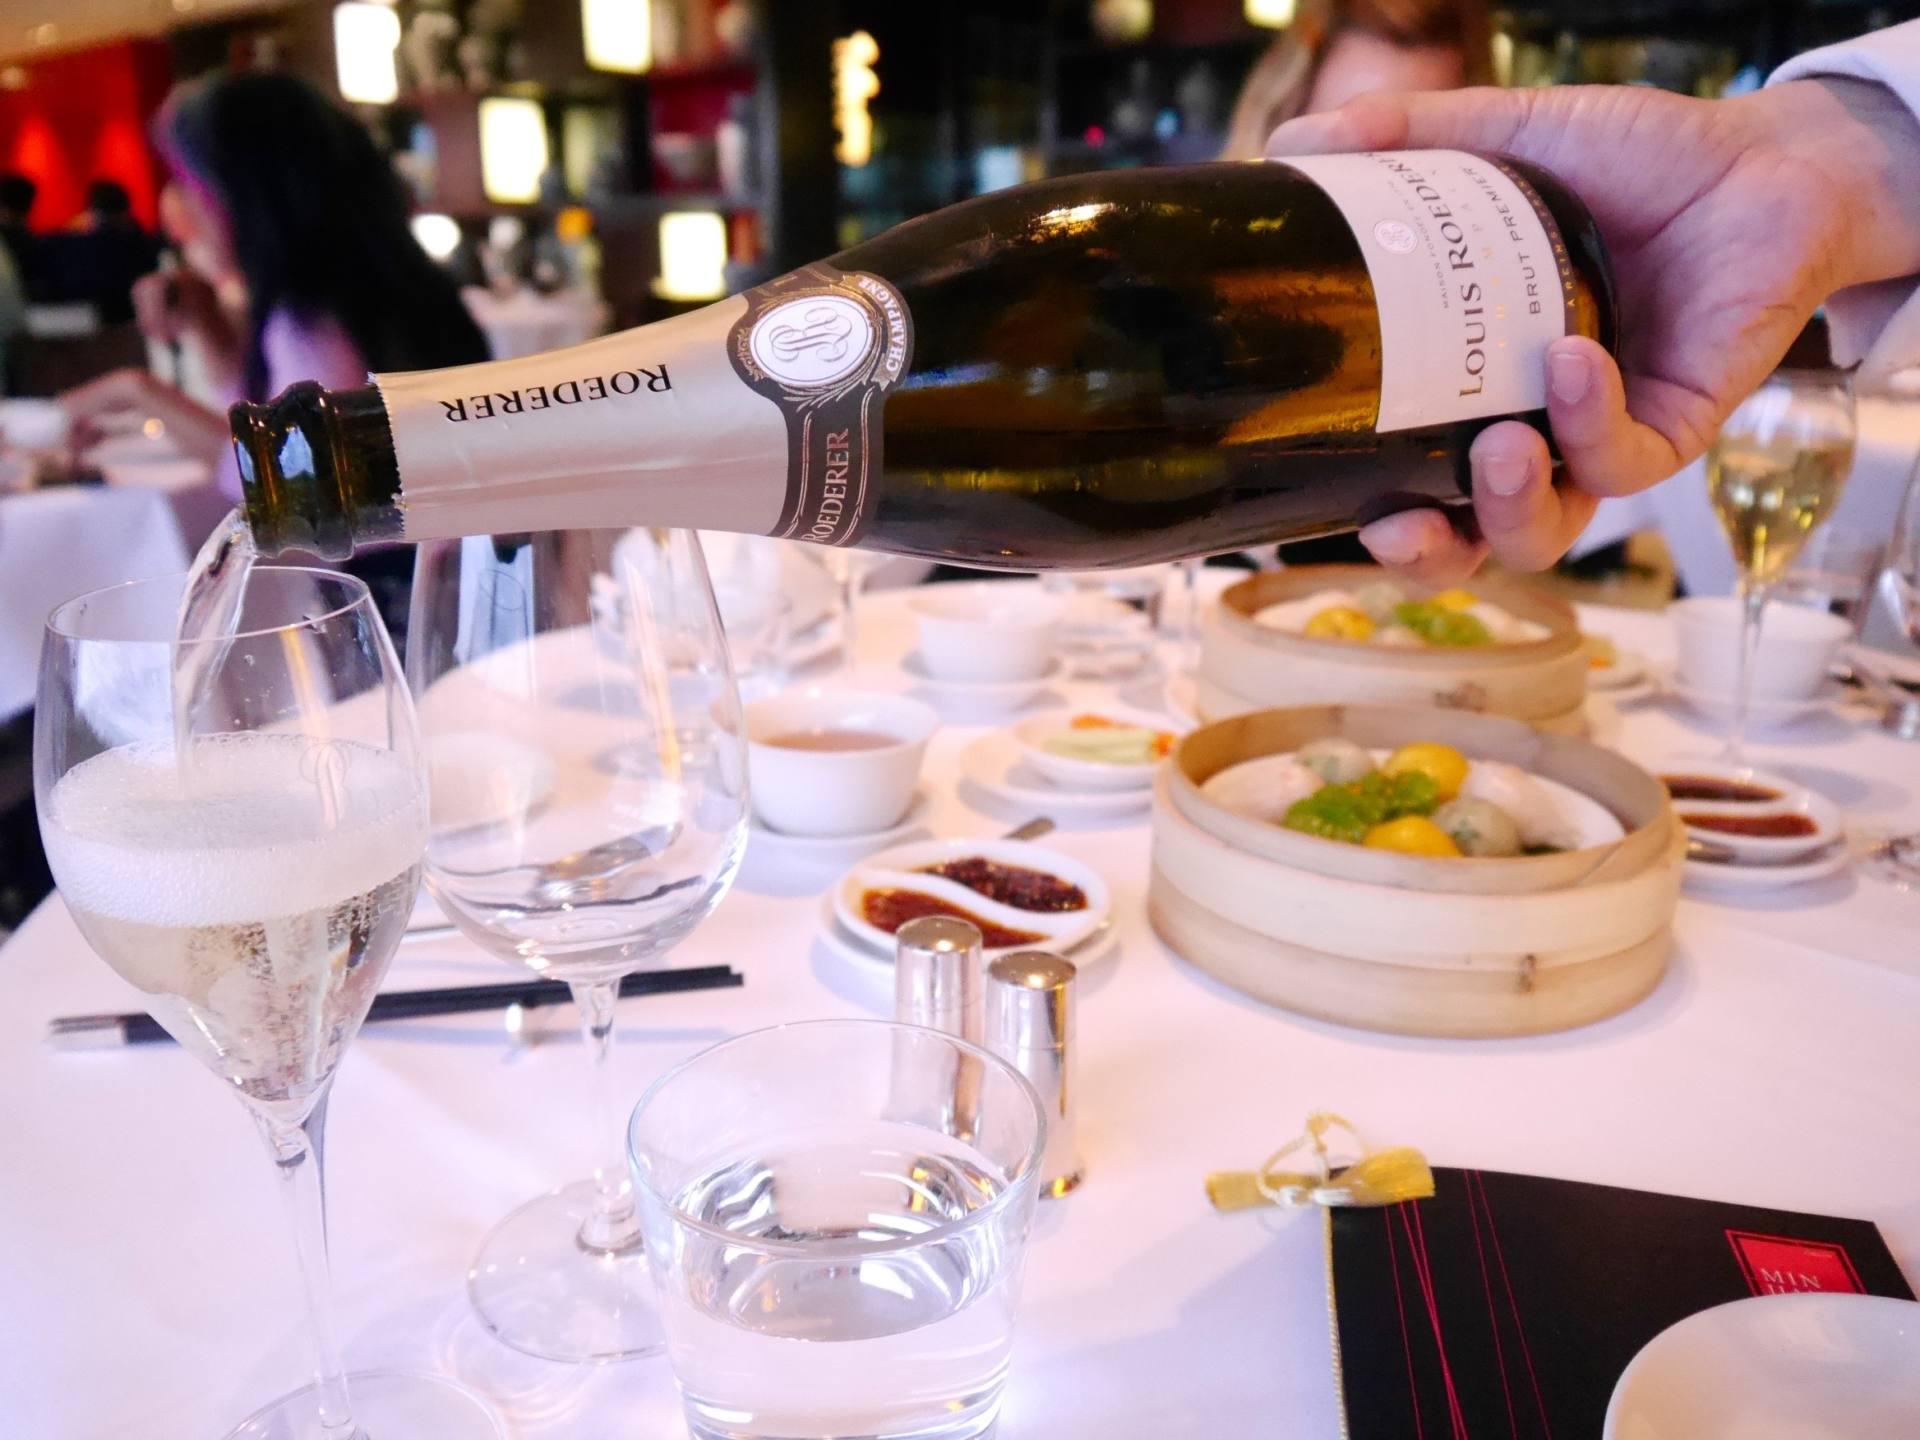 things to know before visiting London - champagne at Min Jiang